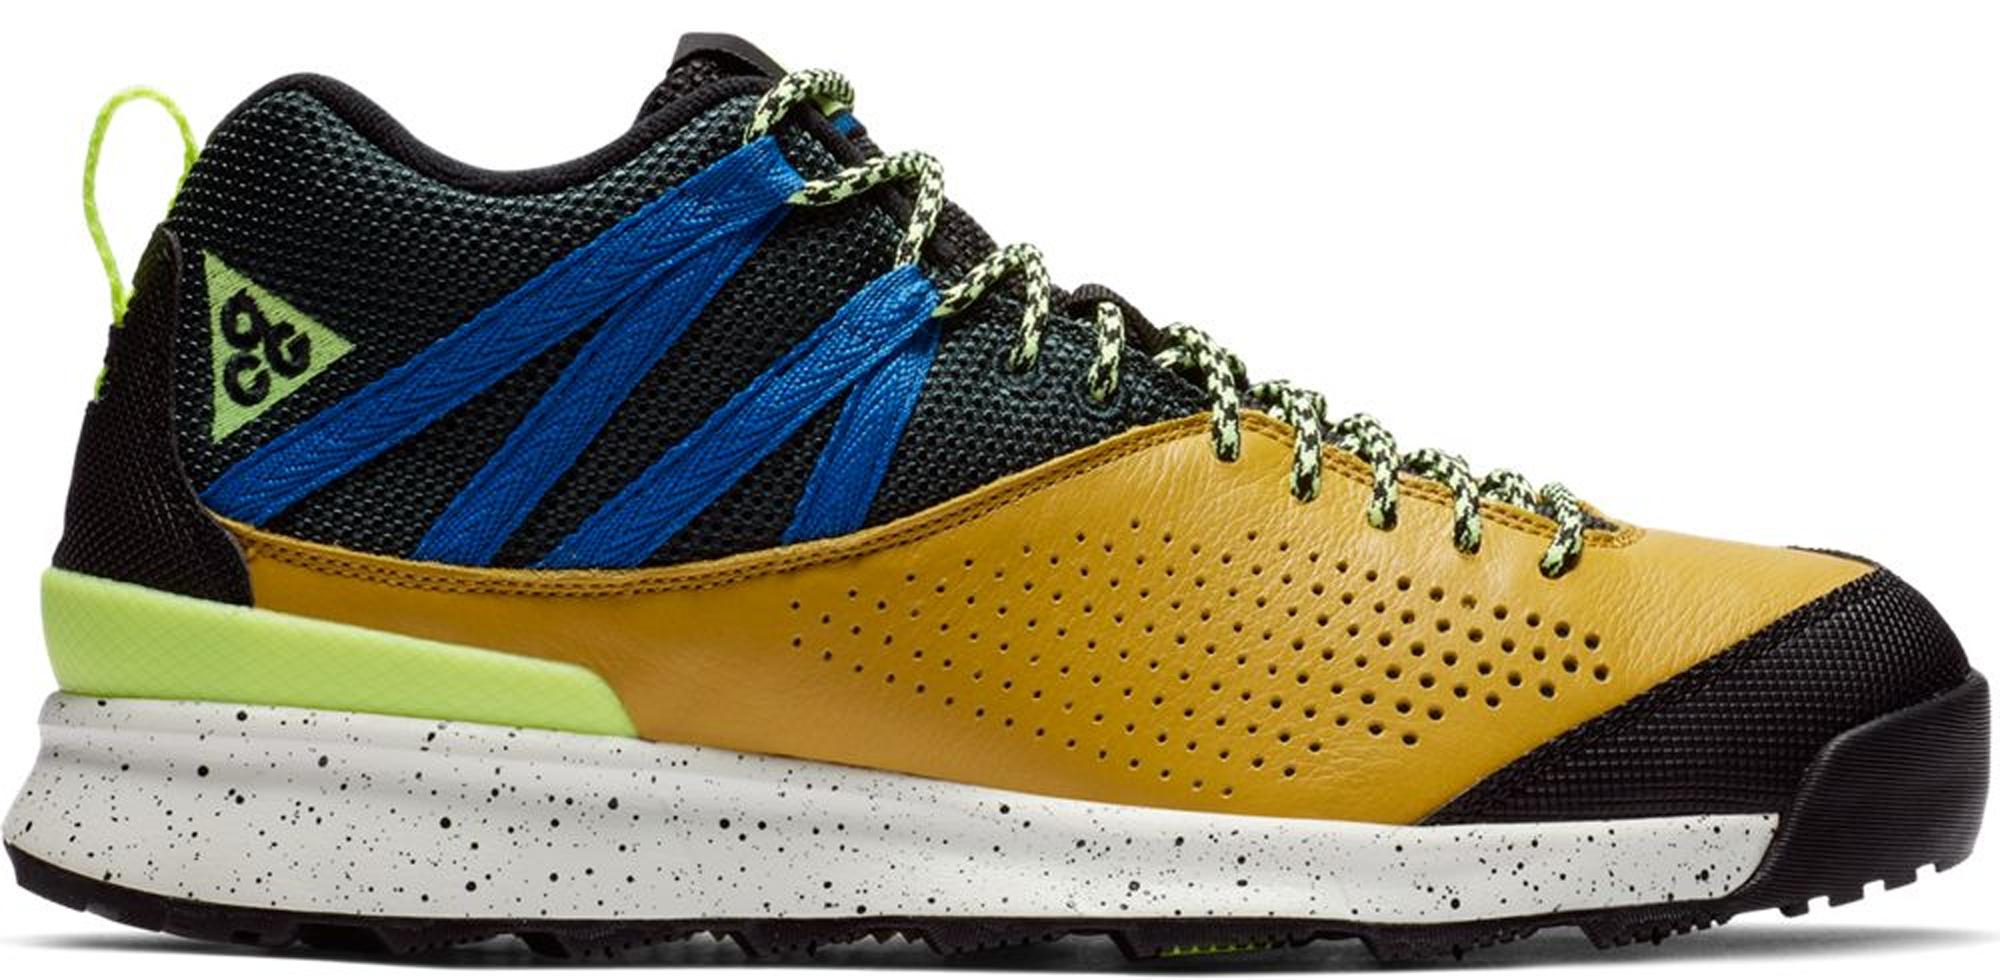 Nike Okwahn II Dark Citron Outdoor